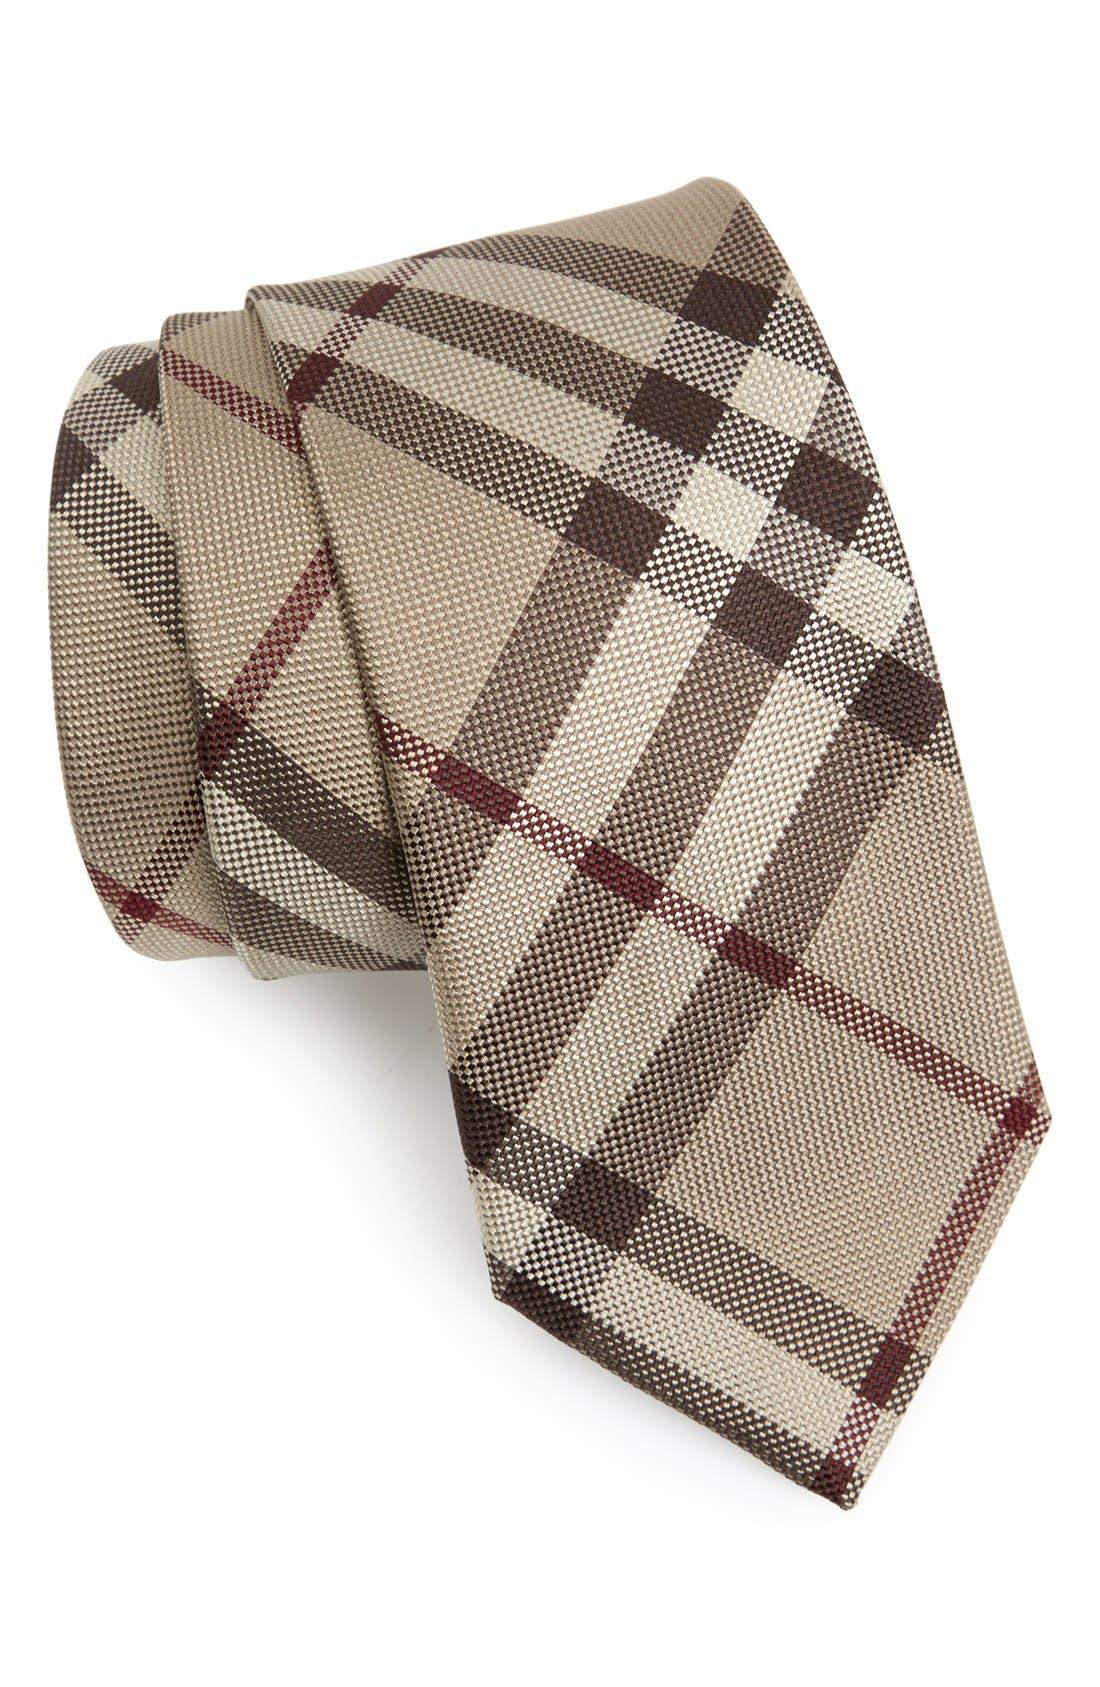 Alternate Image 1 Selected - Burberry Silk Tie